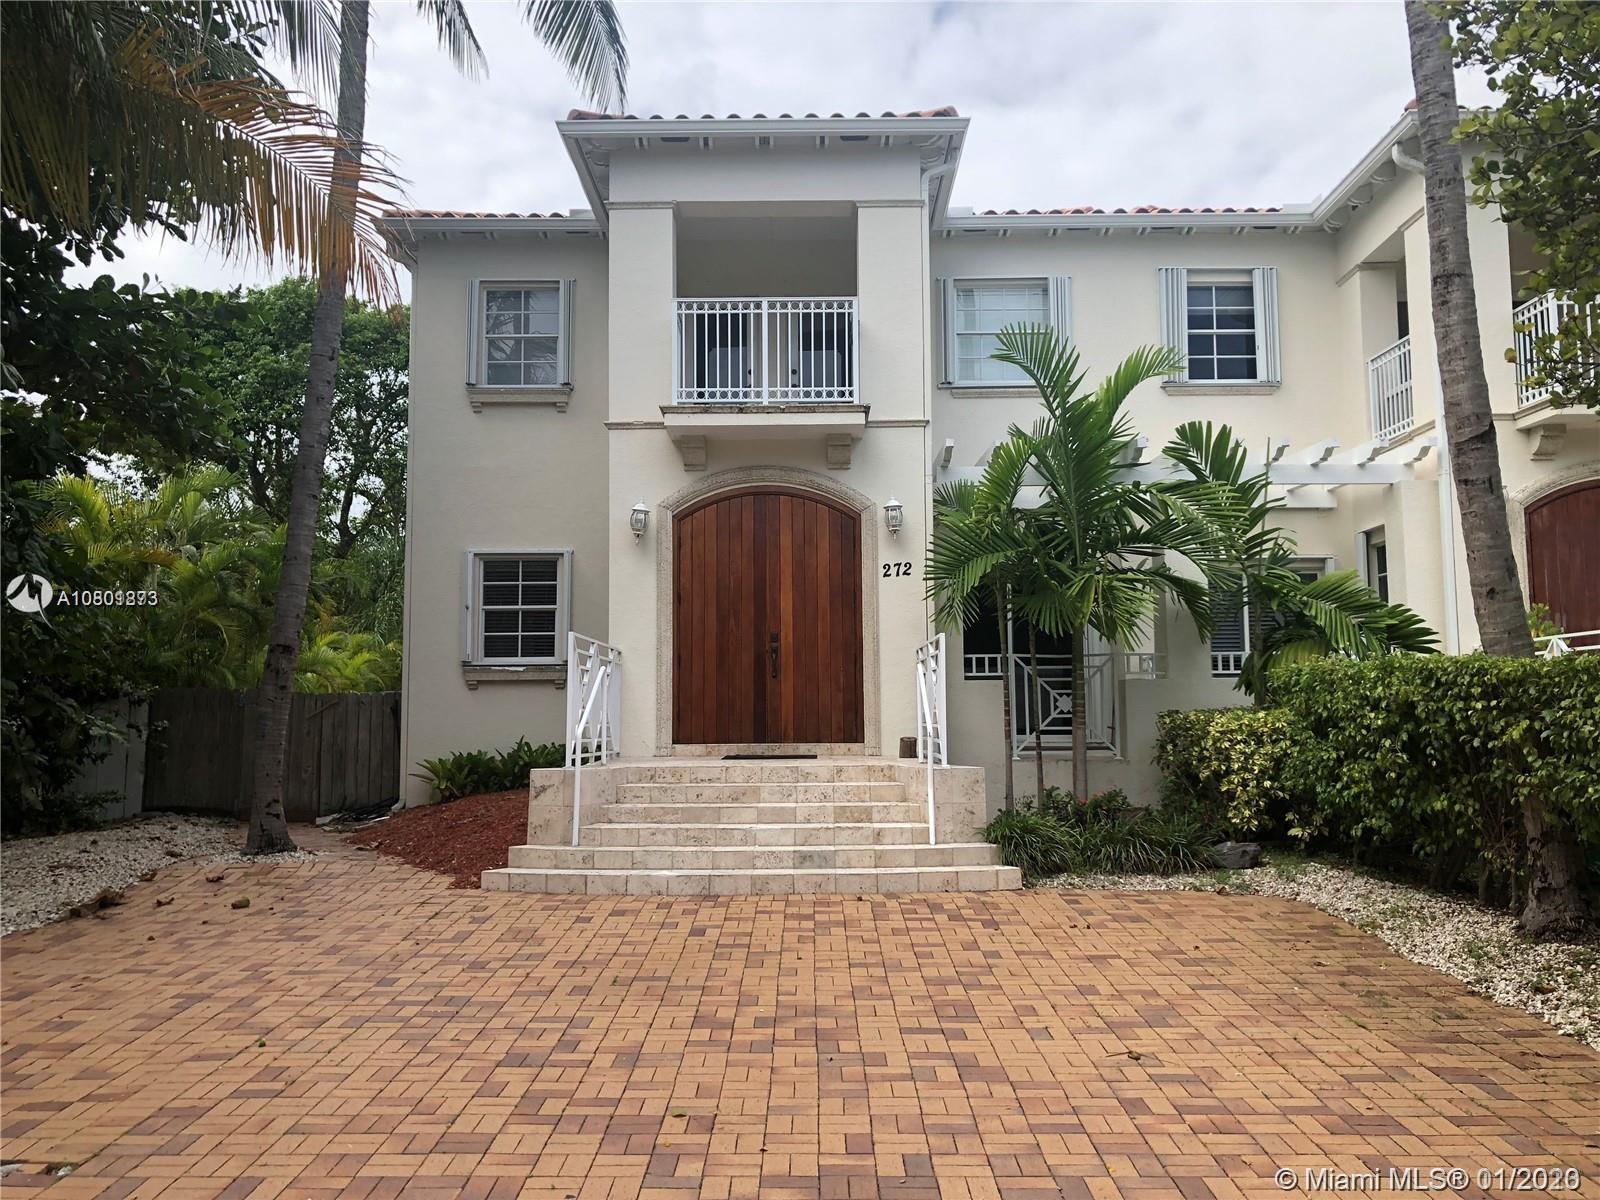 272  Fernwood Rd  For Sale A10801873, FL